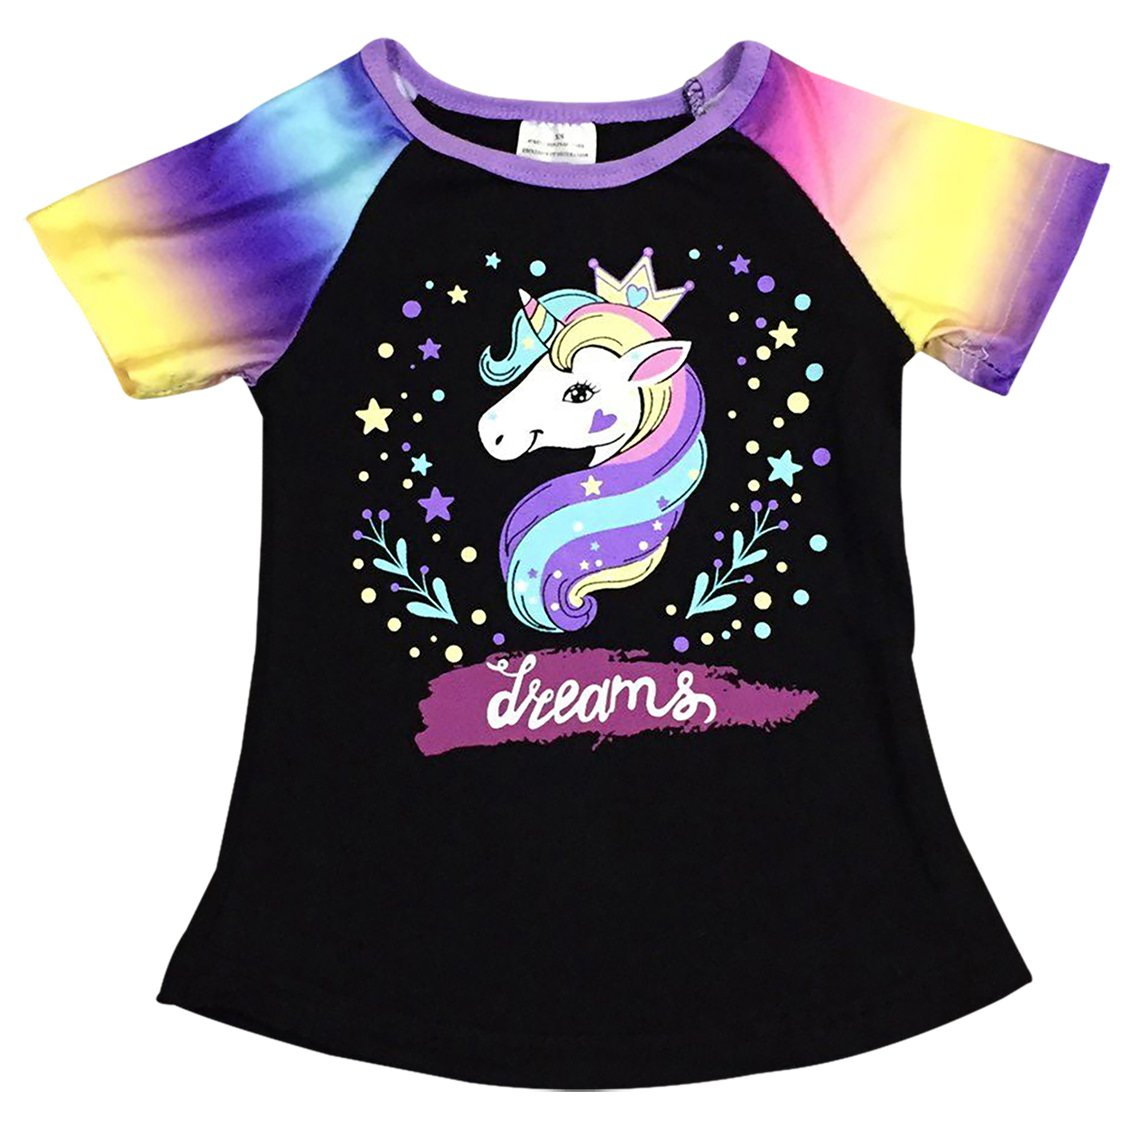 Dreamer P Big Girls' Short Sleeve Rainbow Sleeve Unicorn Party Summer Top T Shirt Tee Black 8 XXXL (P201487P)